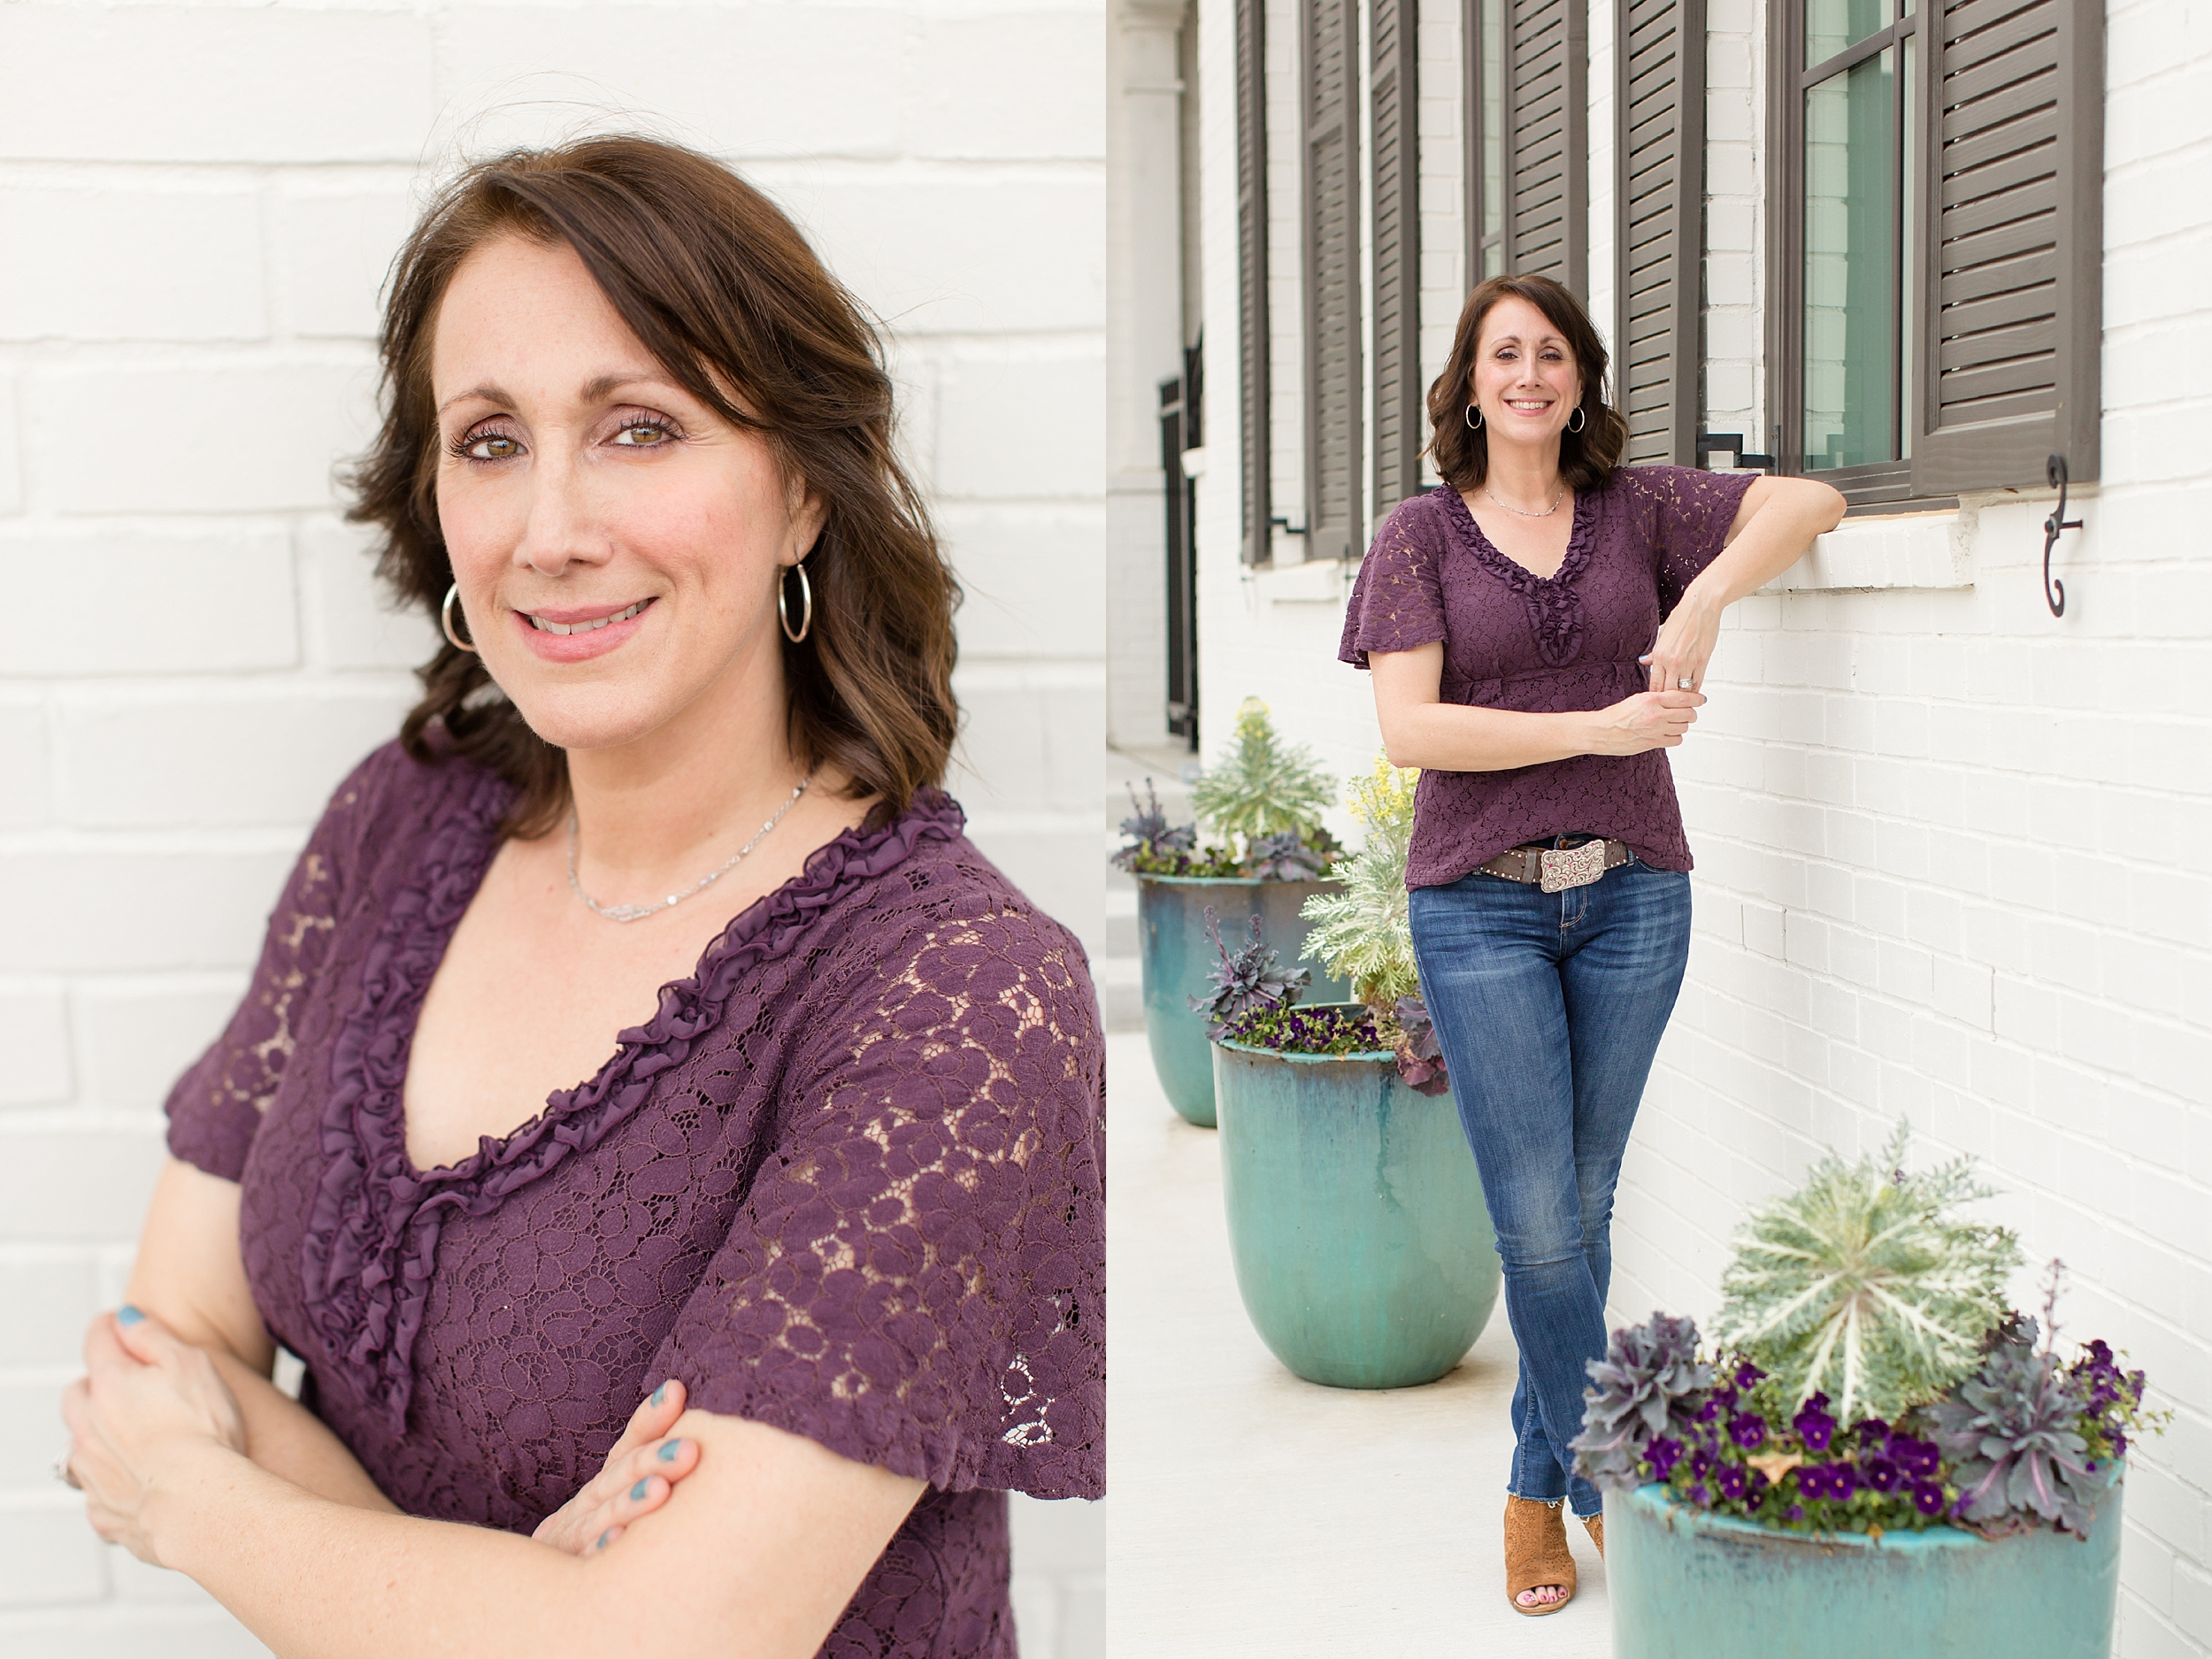 Landon-Schneider-Photography-Portrait-Session-Texas_0008.jpg